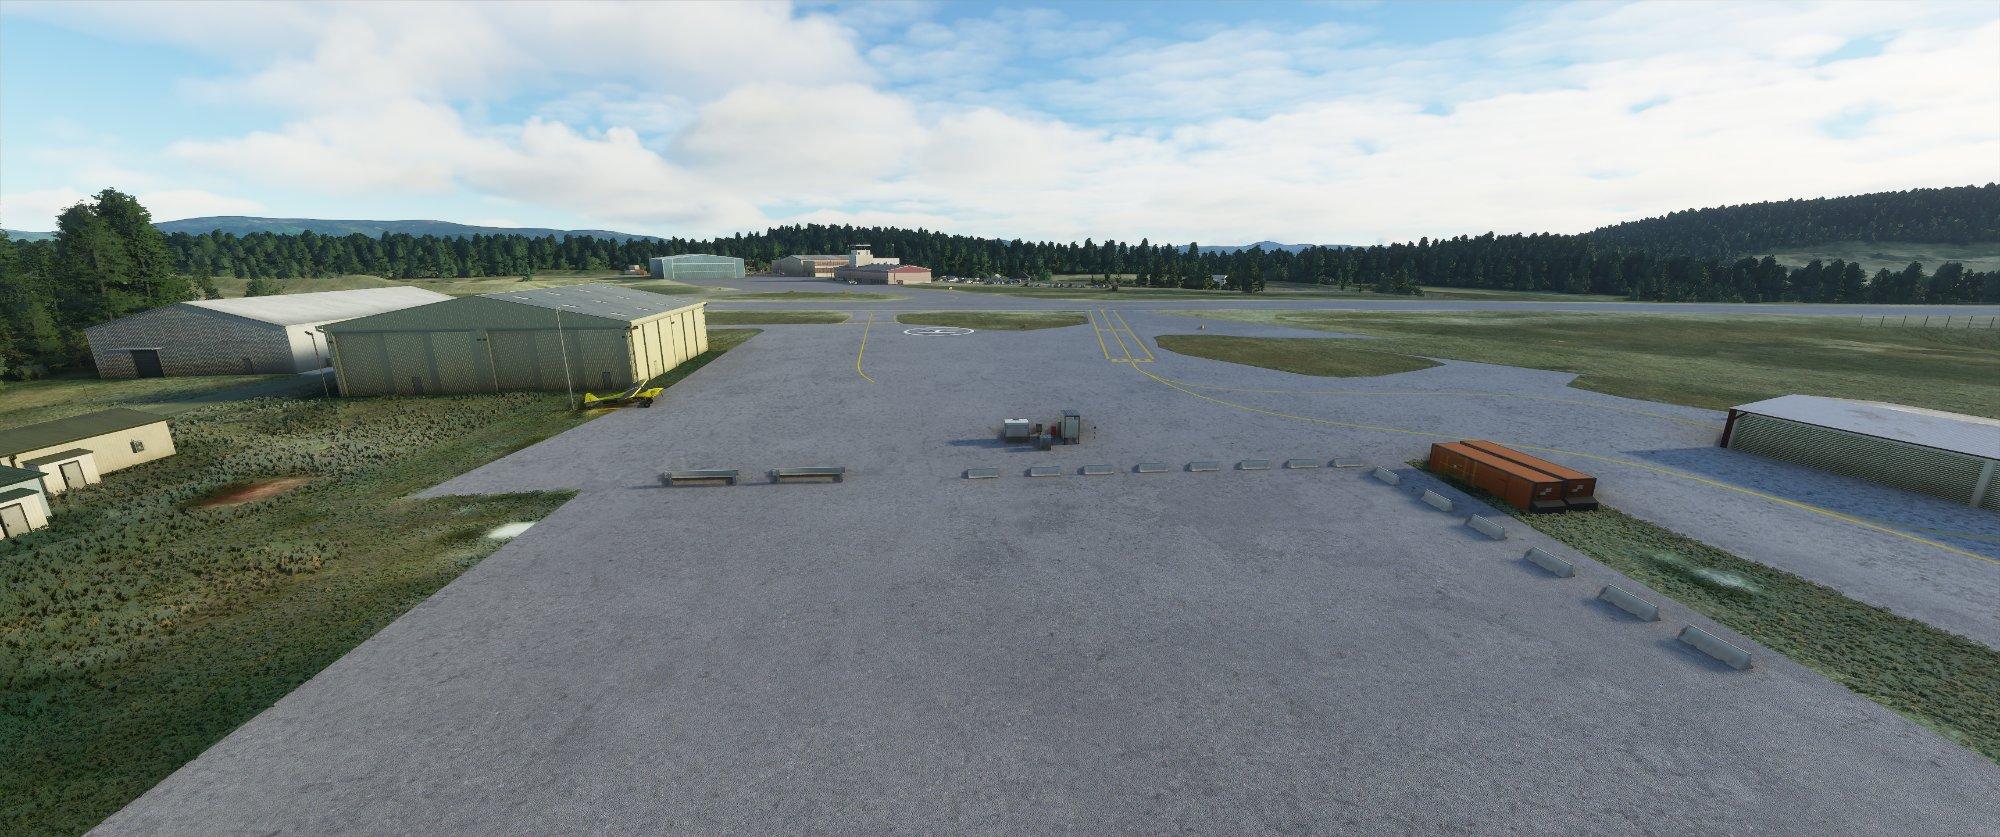 Microsoft Flight Simulator Screenshot 2020.10.28 - 11.41.29.86.jpg